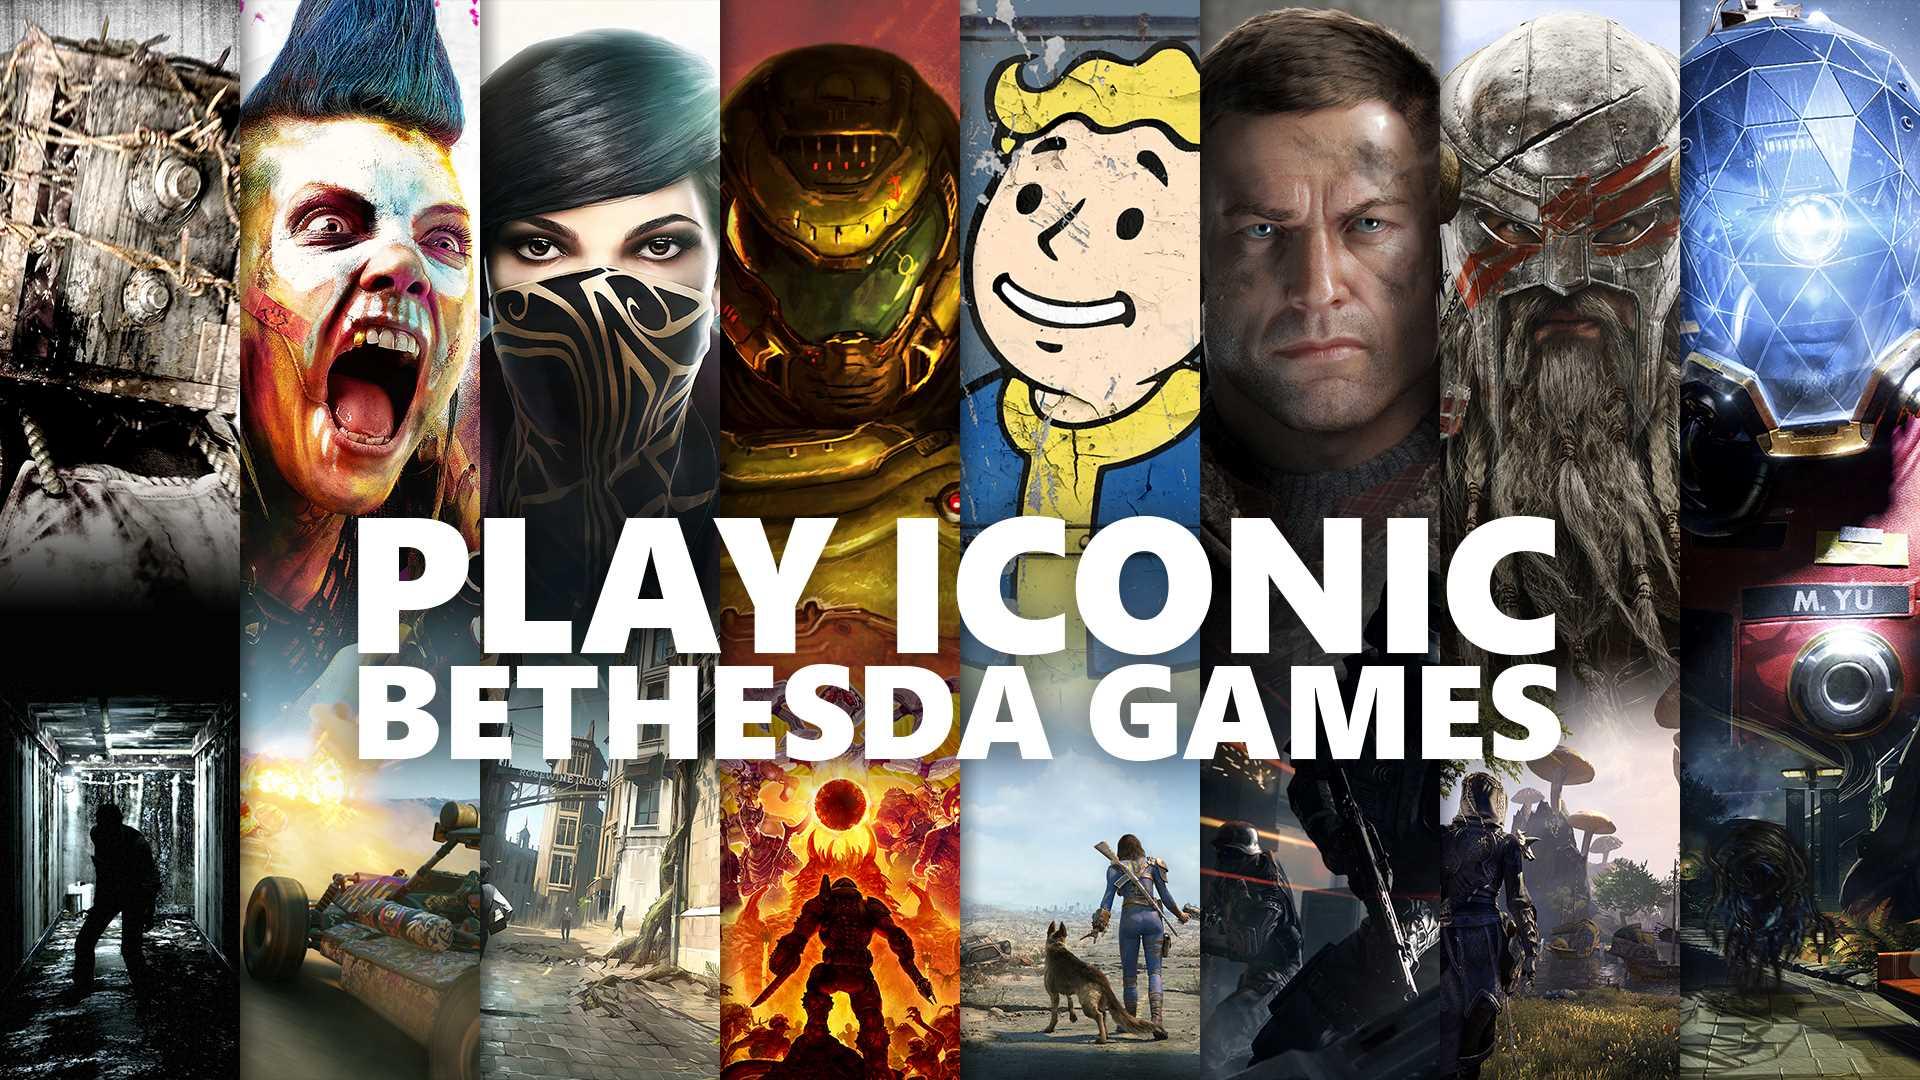 Bethesda Xbox Game Pass Keyart